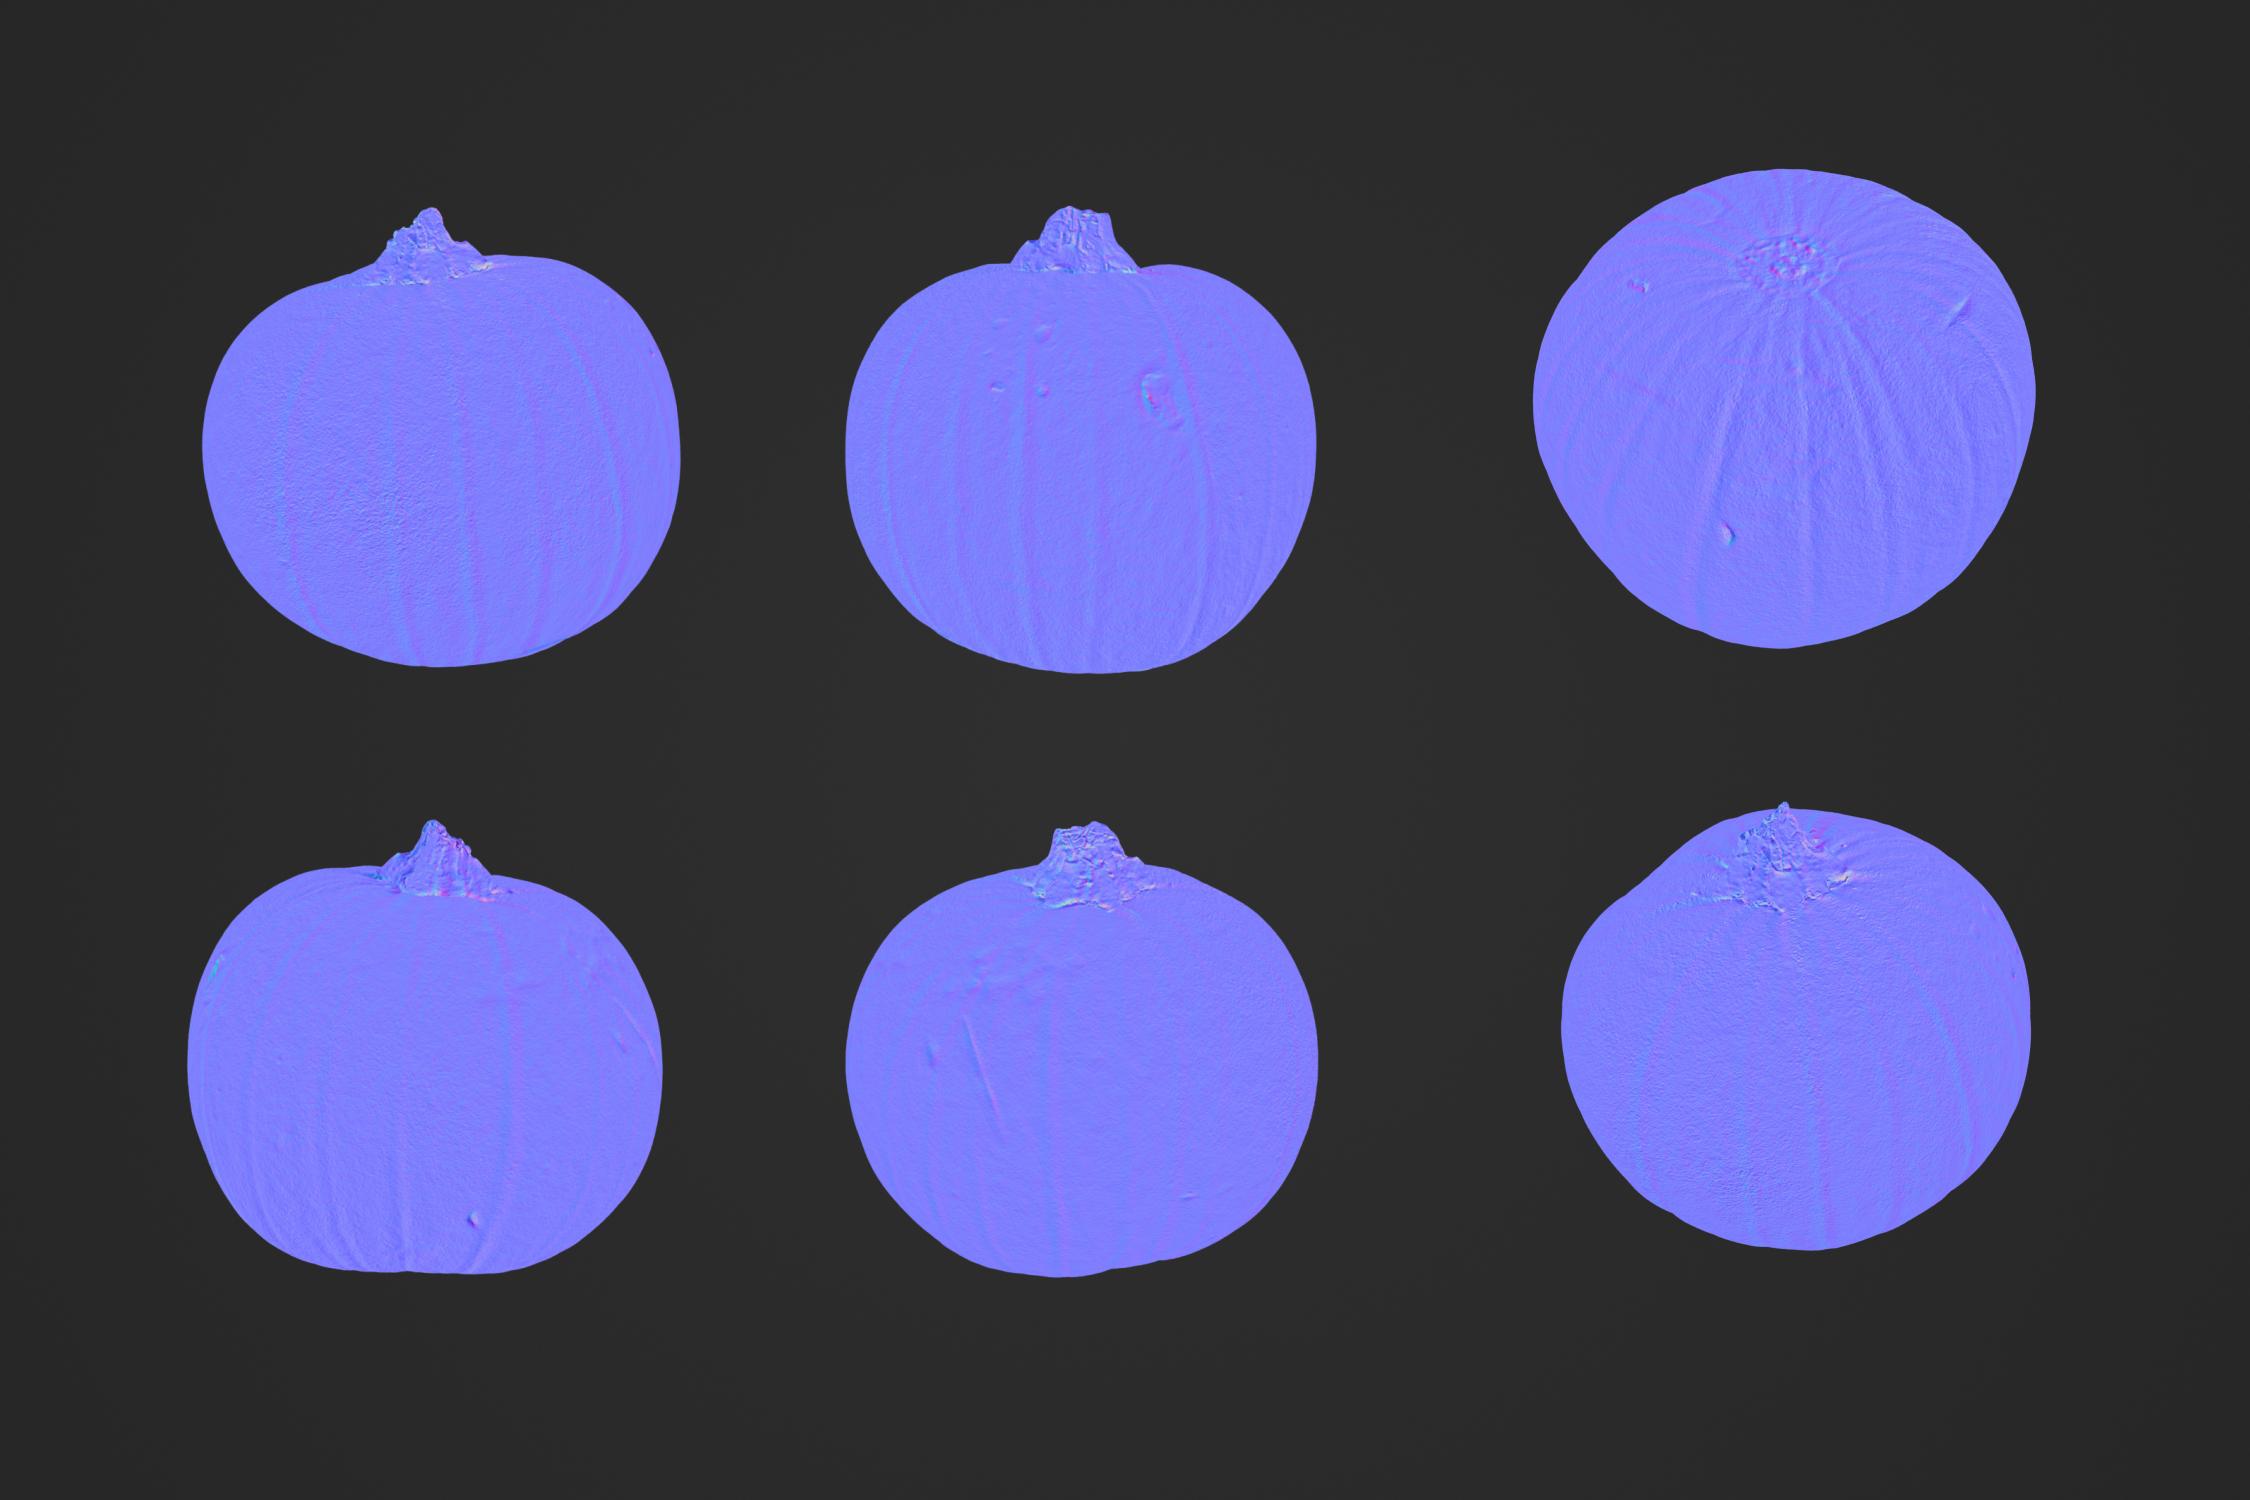 Small_Pumpkin_1_3.jpg